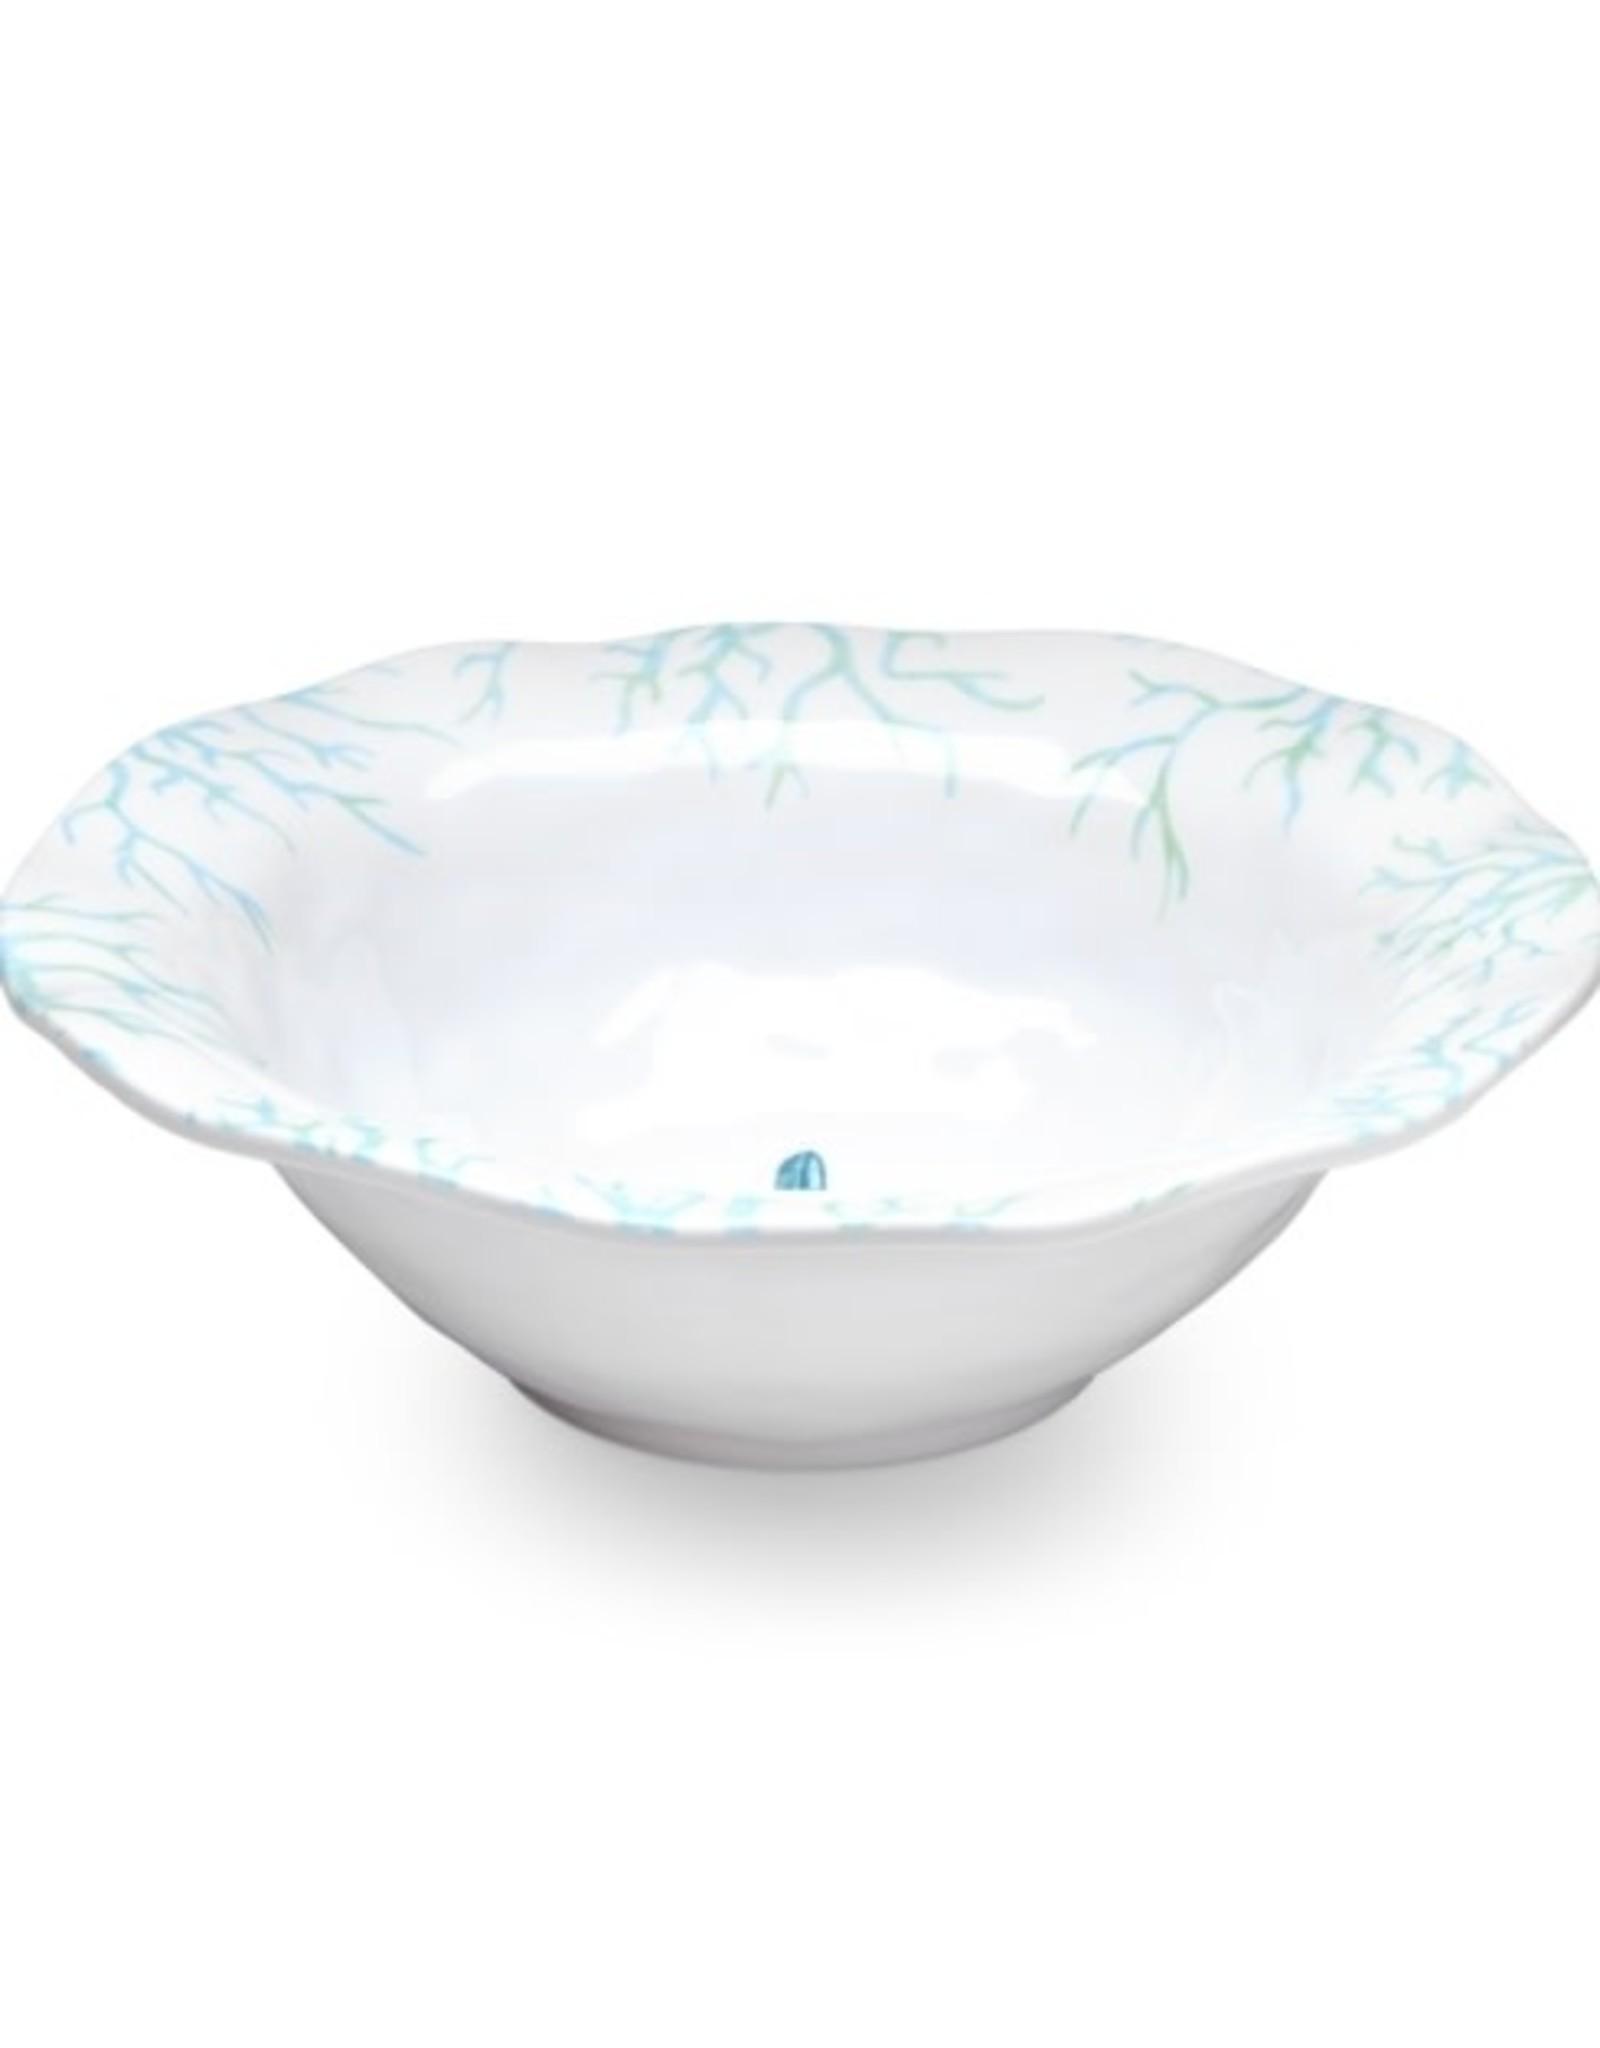 "Q-Squared QSQ Captiva 12"" Serving Bowl"